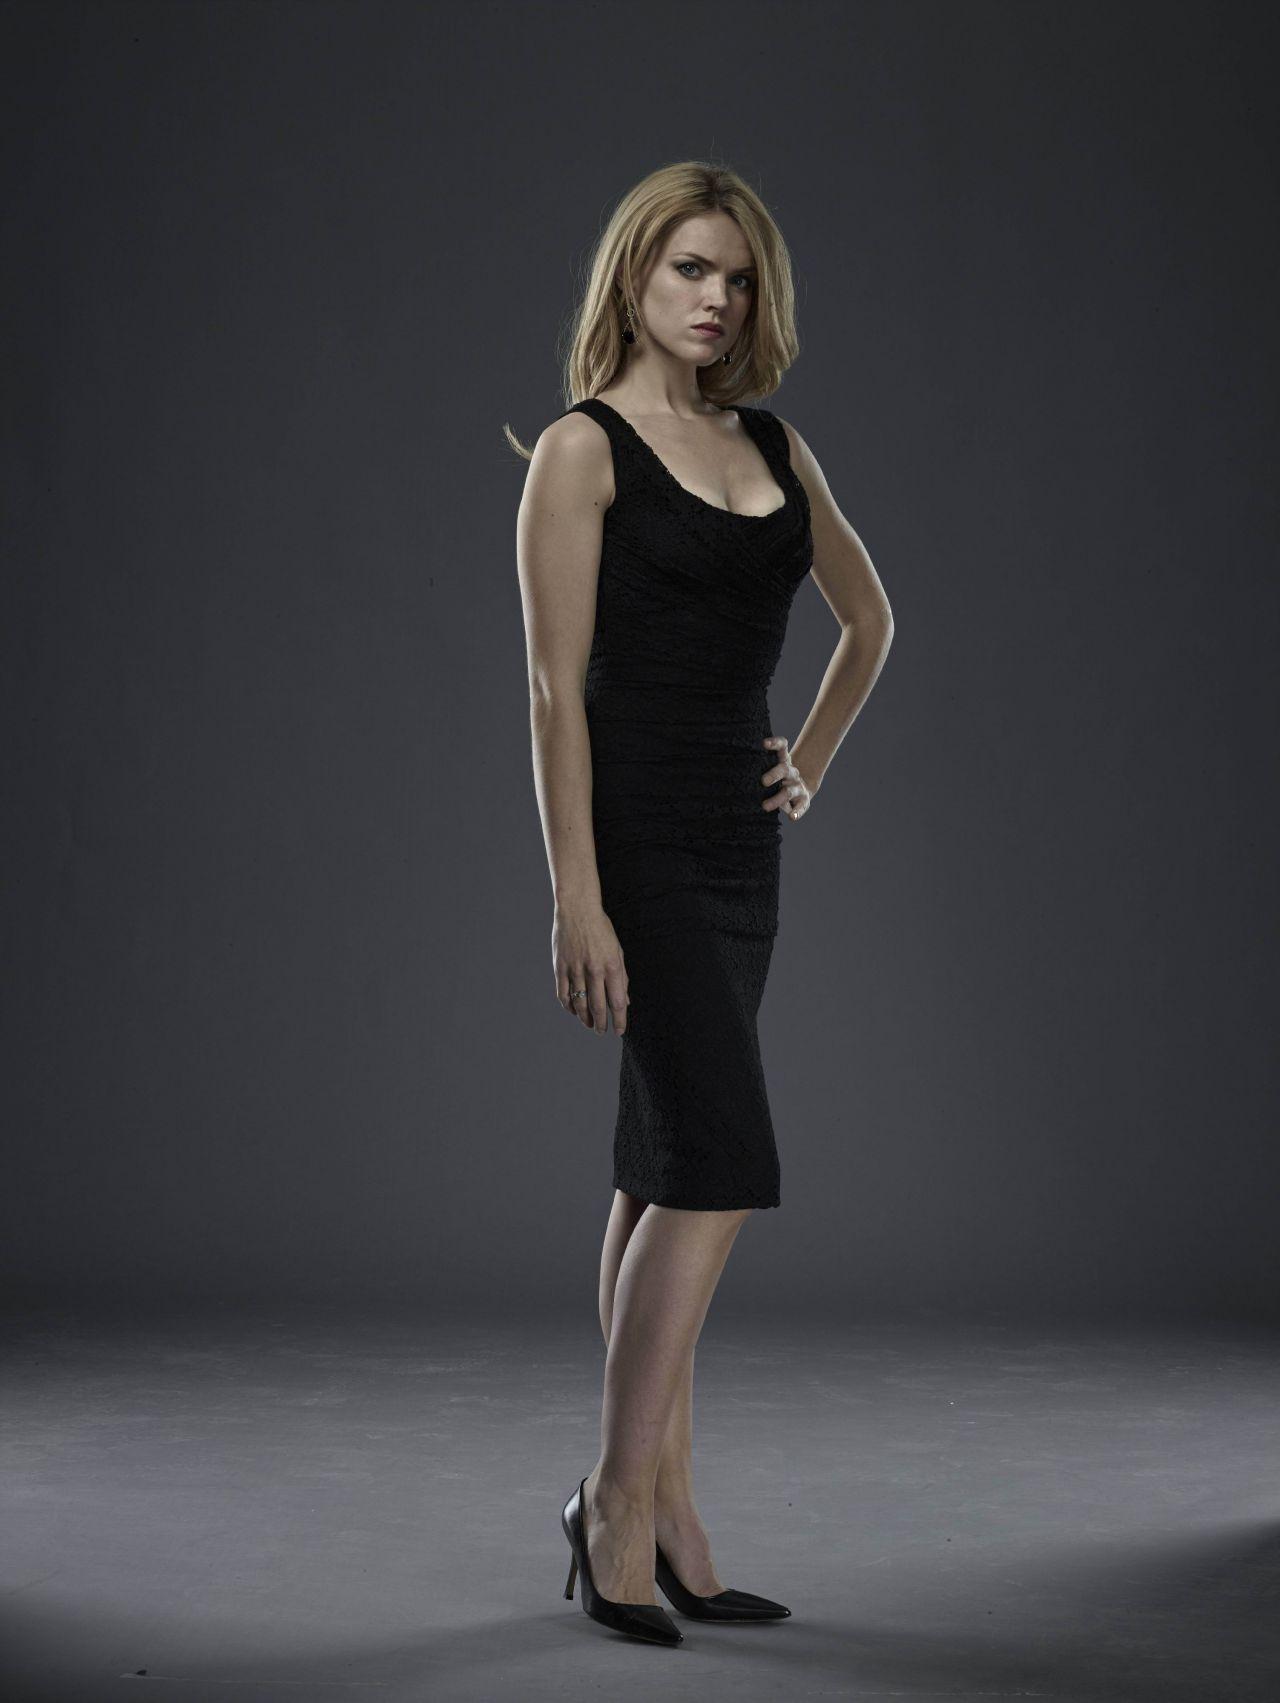 Erin Richards Gotham Tv Series Season 1 Promoshoot